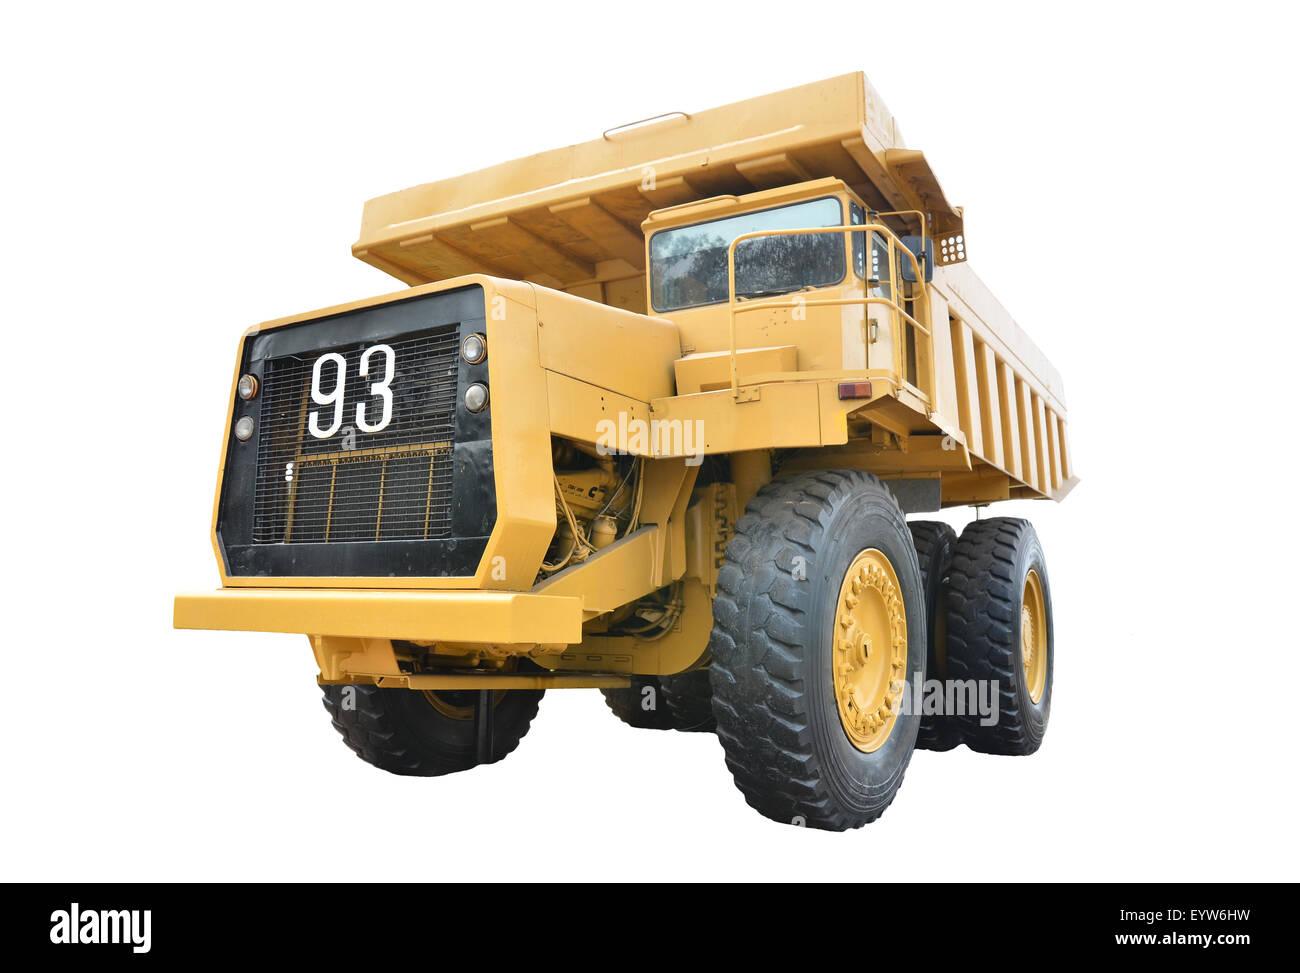 old mining truck isolated on white background - Stock Image